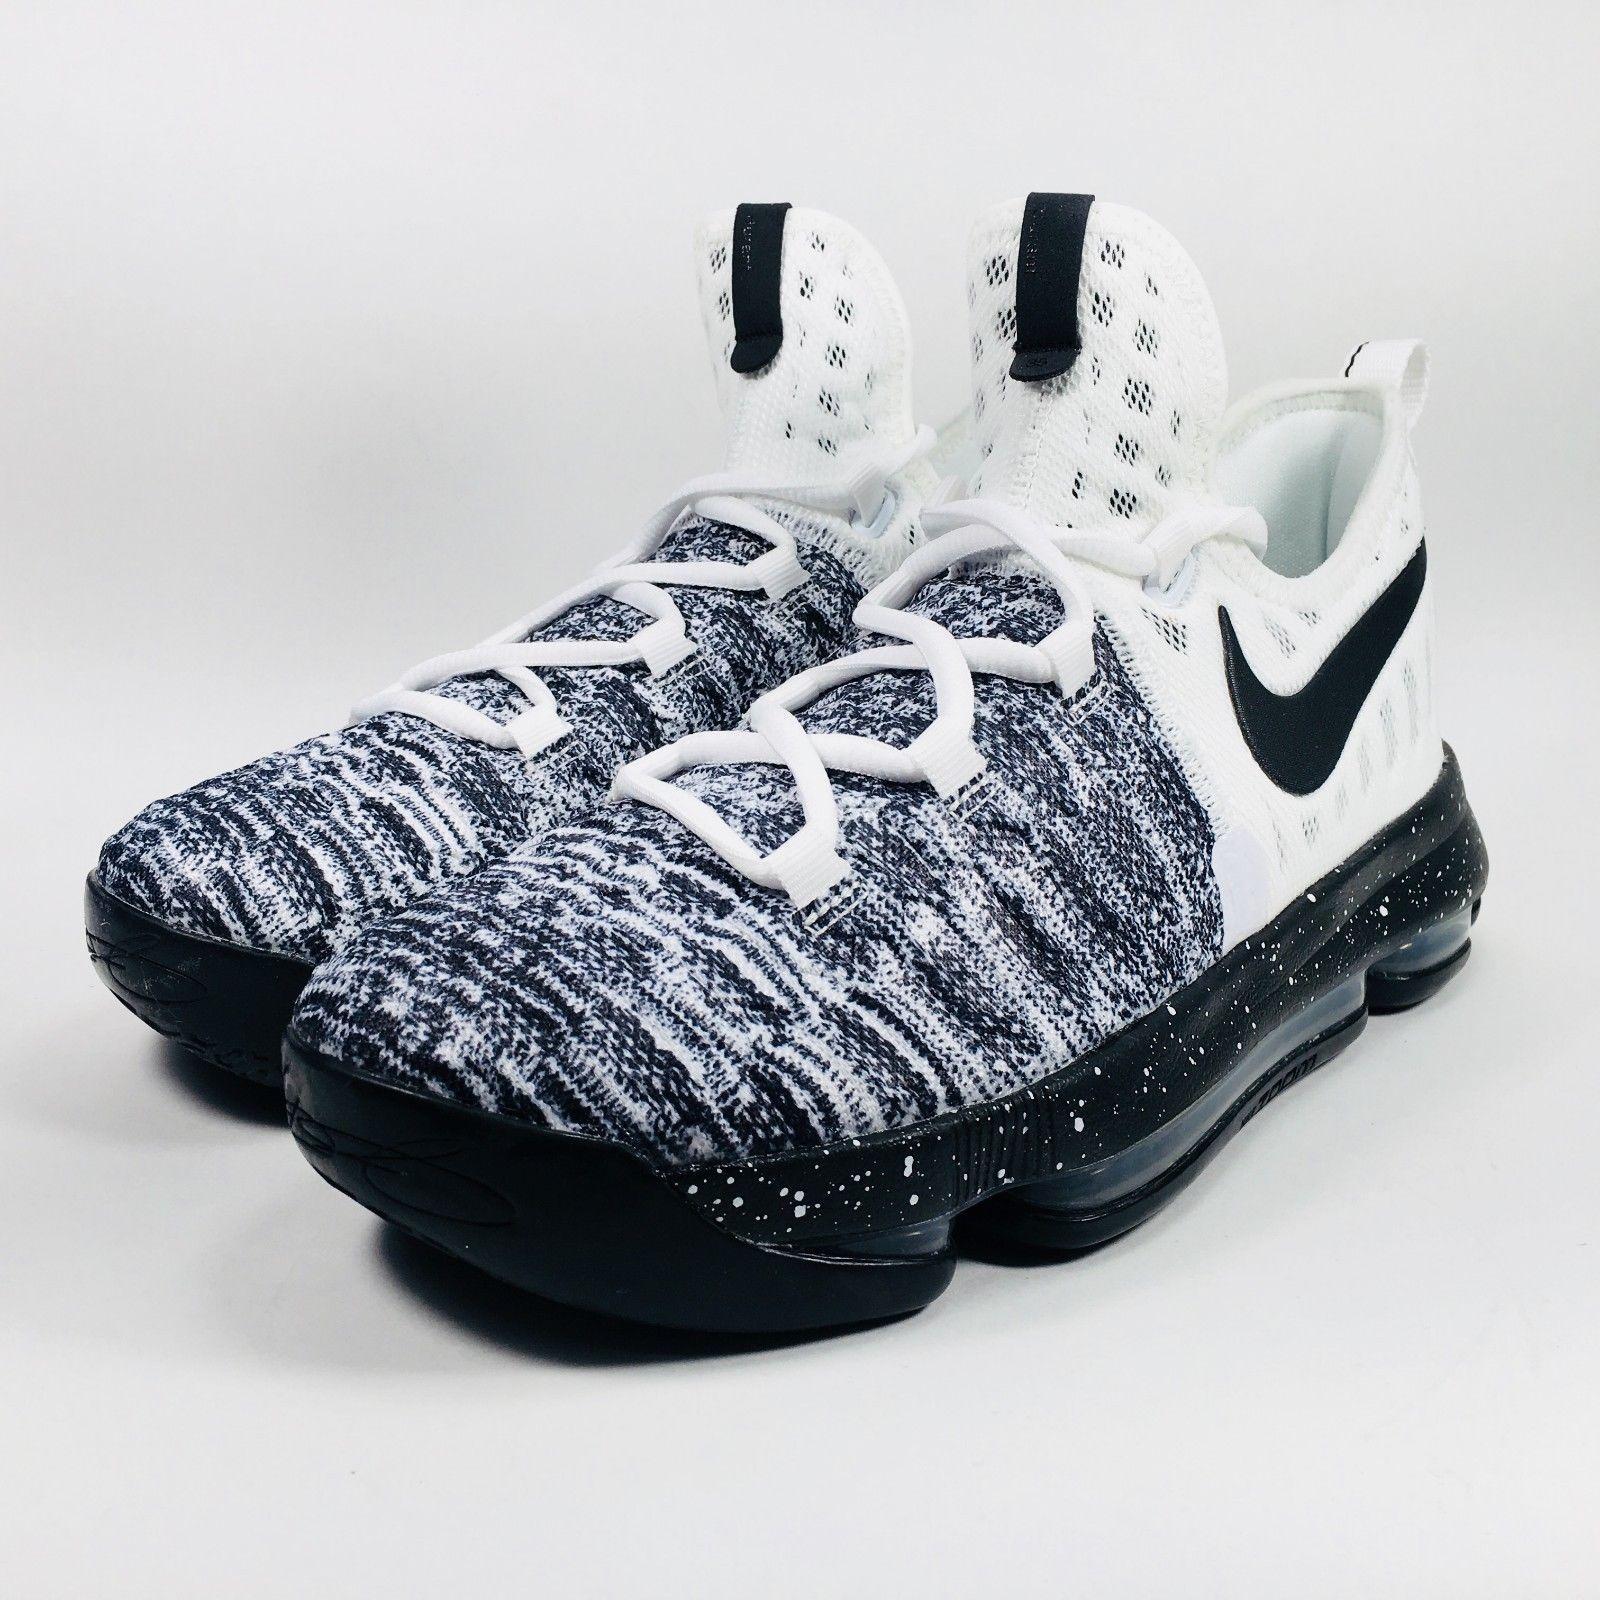 reputable site 1c714 d6d68 Nike KD 9 Oreo Big Kids White Black Basketball Shoes 855908-100 Youth Size  (eBay Link)